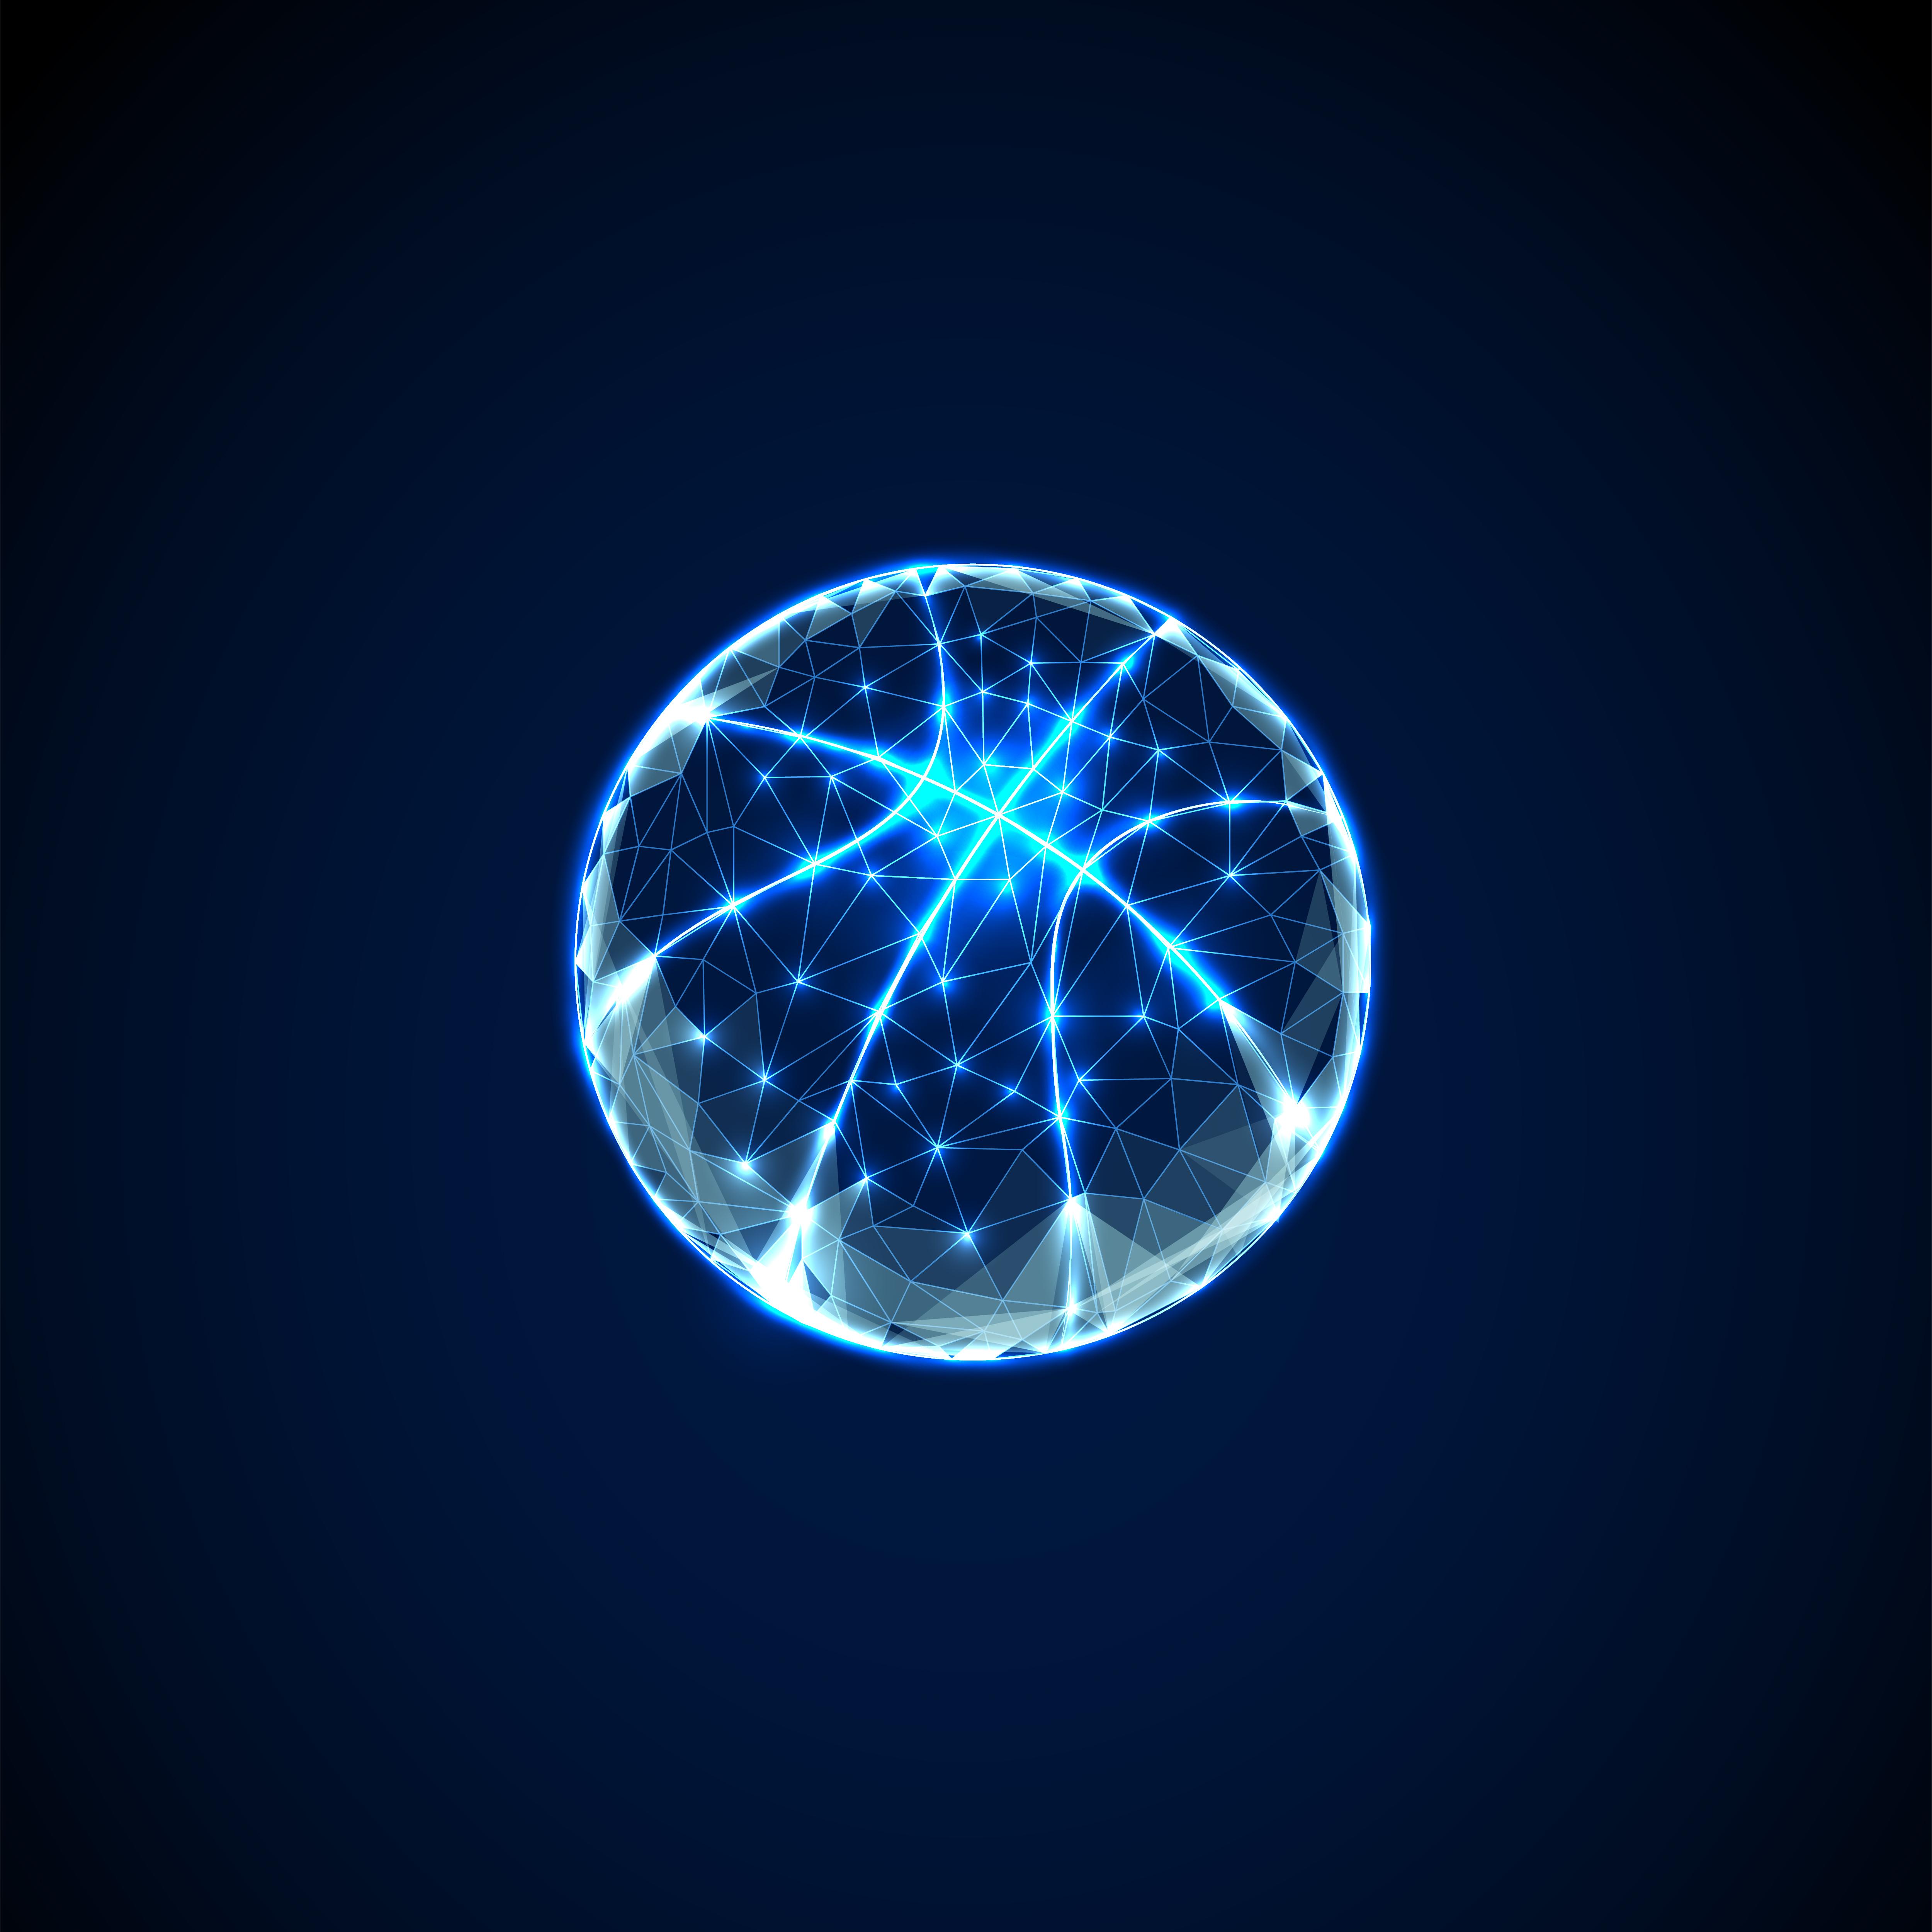 Abstract basketball ball. Low polygonal style design.